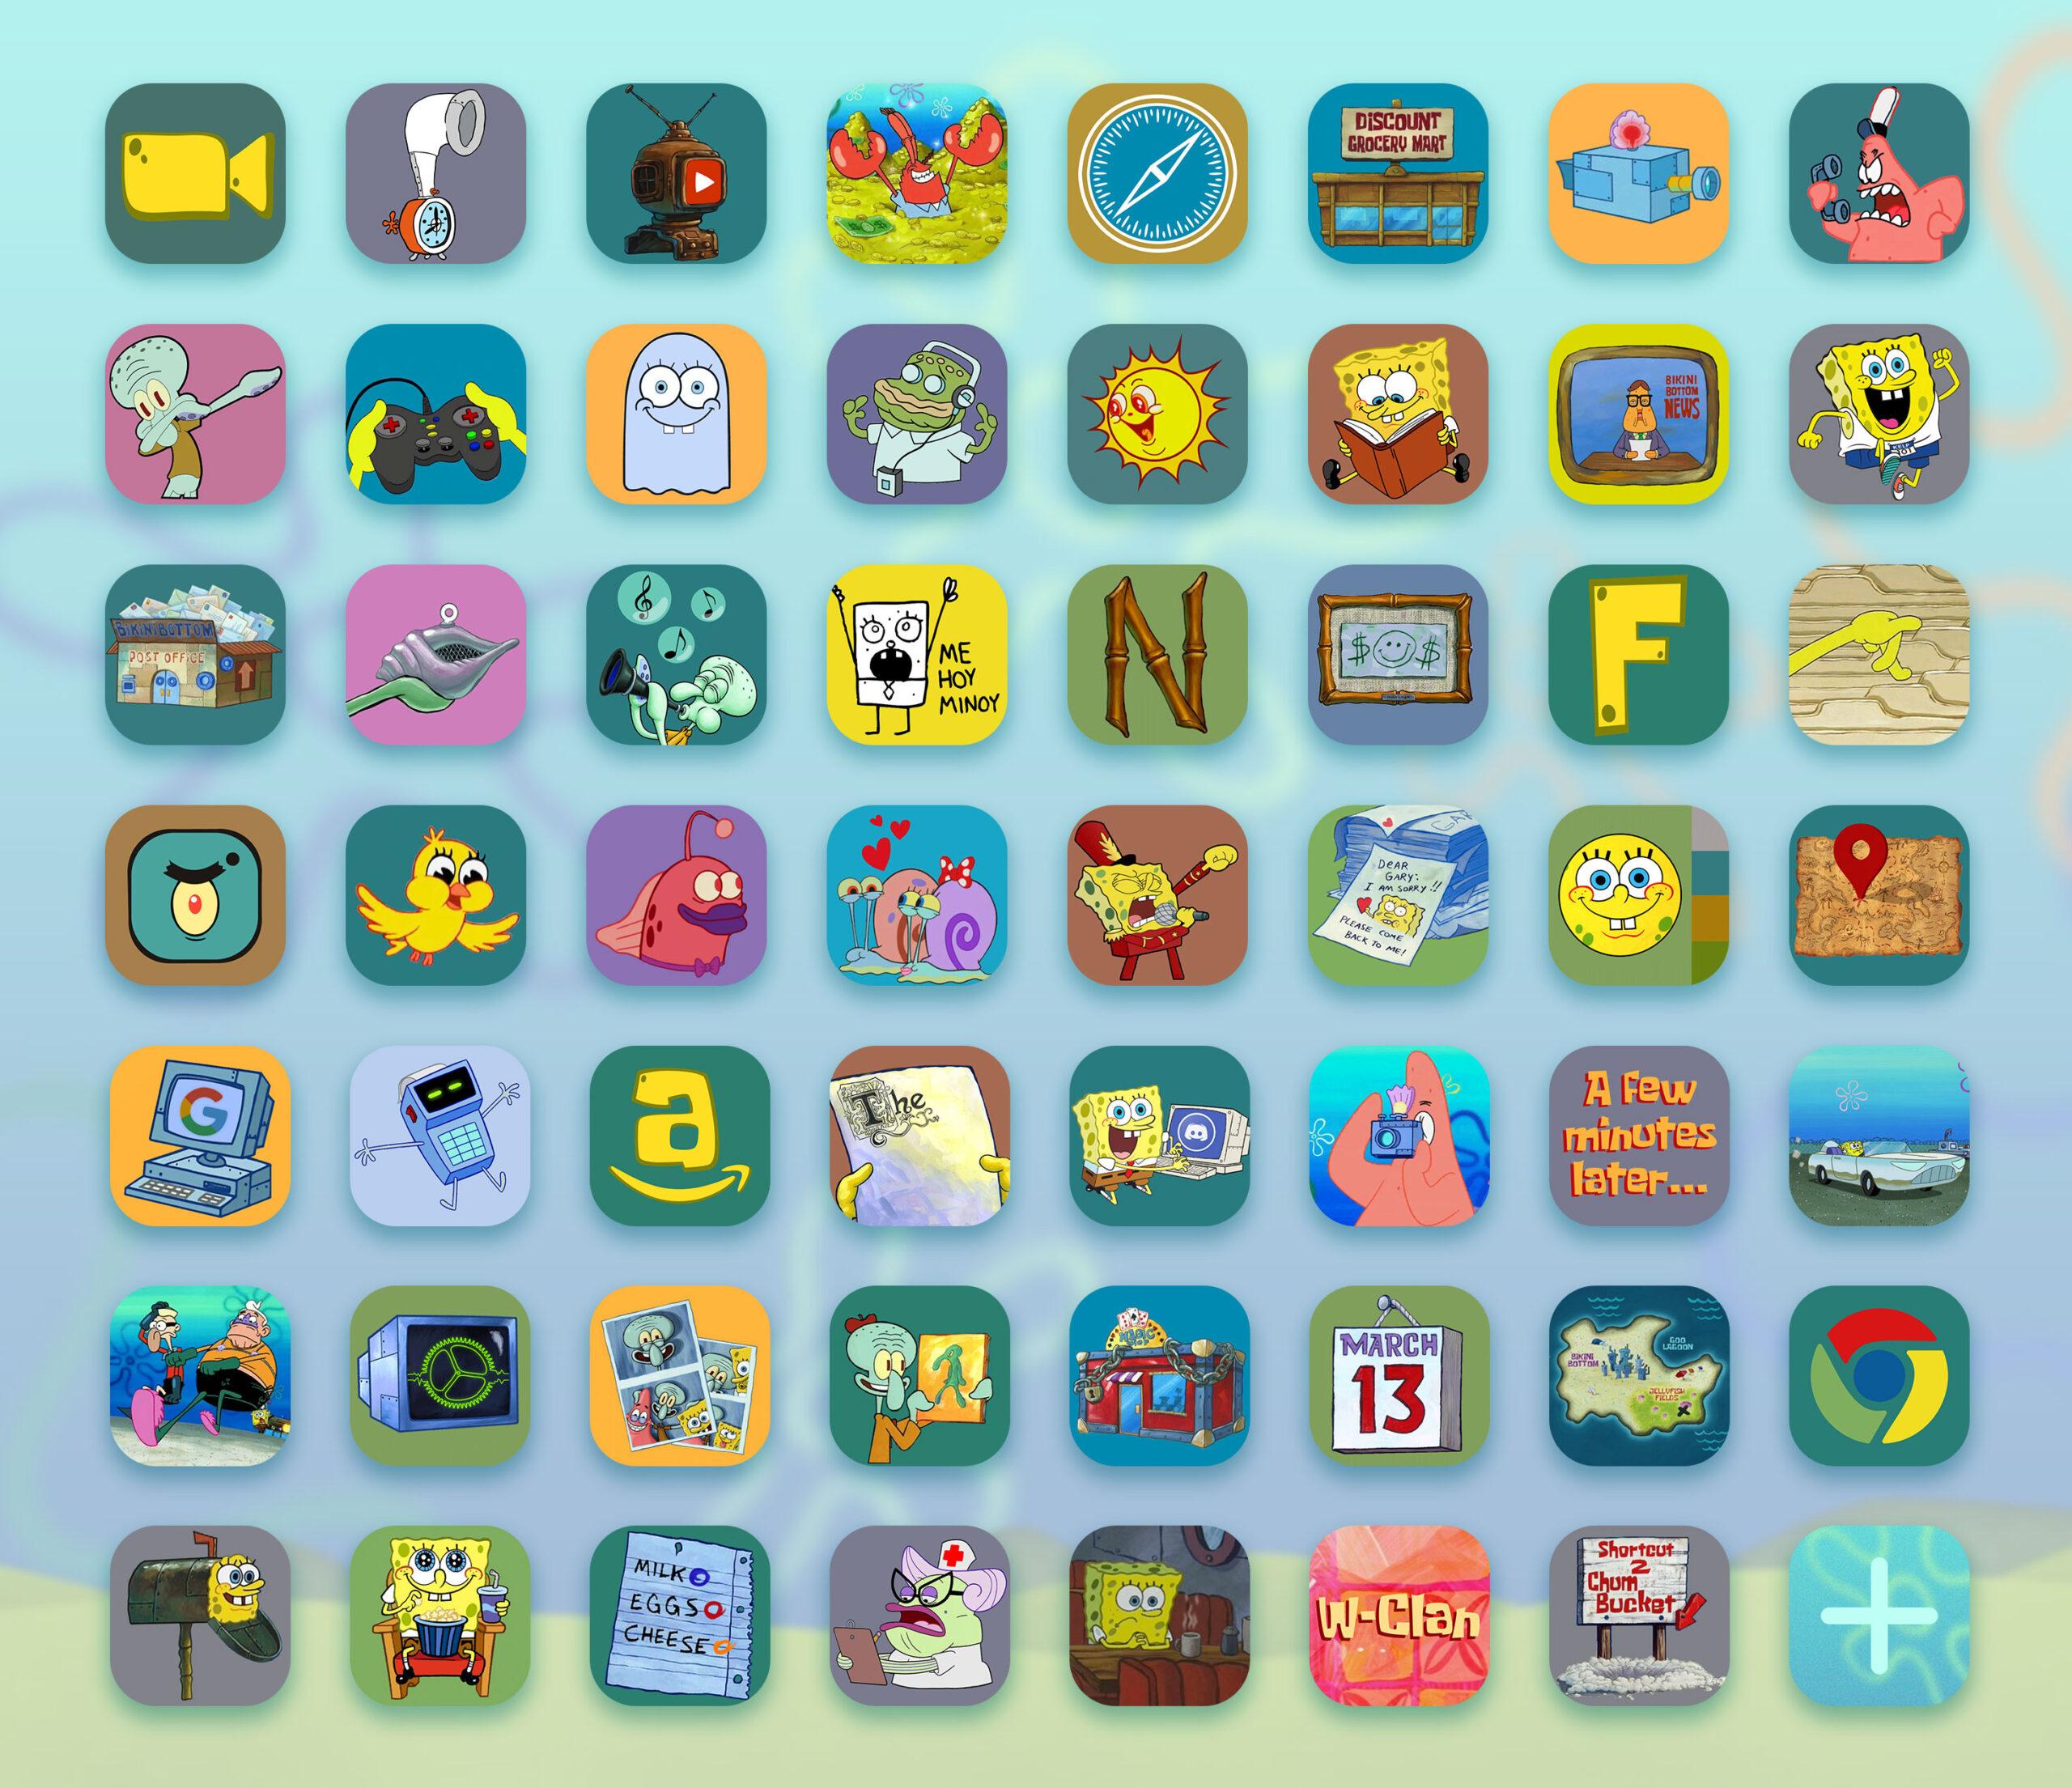 spongebob app icons pack preview 3